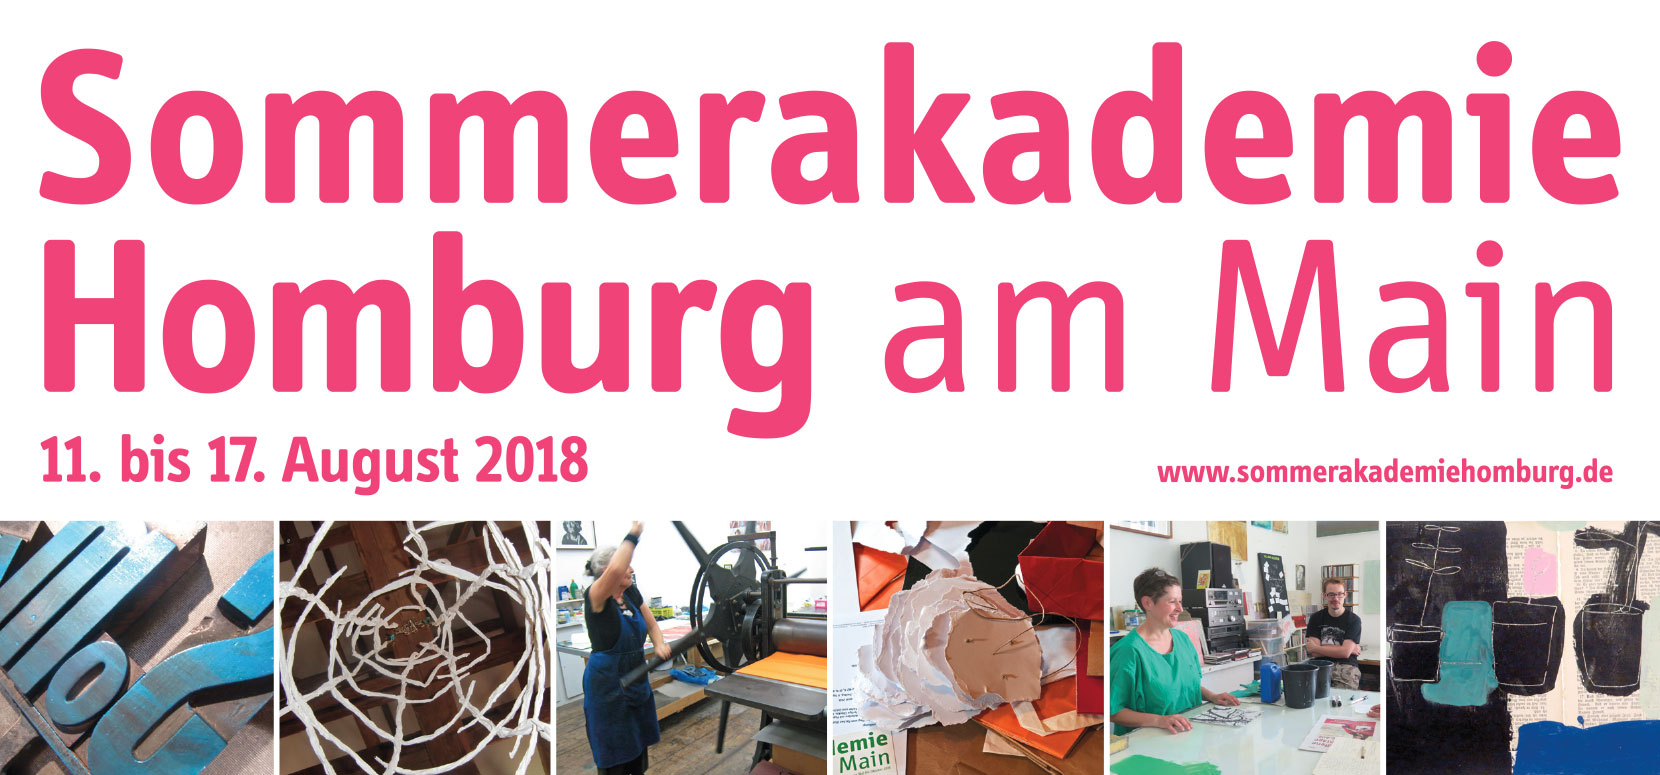 http://www.sommerakademiehomburg.de/site/wp-content/uploads/2016/12/sommerakademie-karte2018.jpg